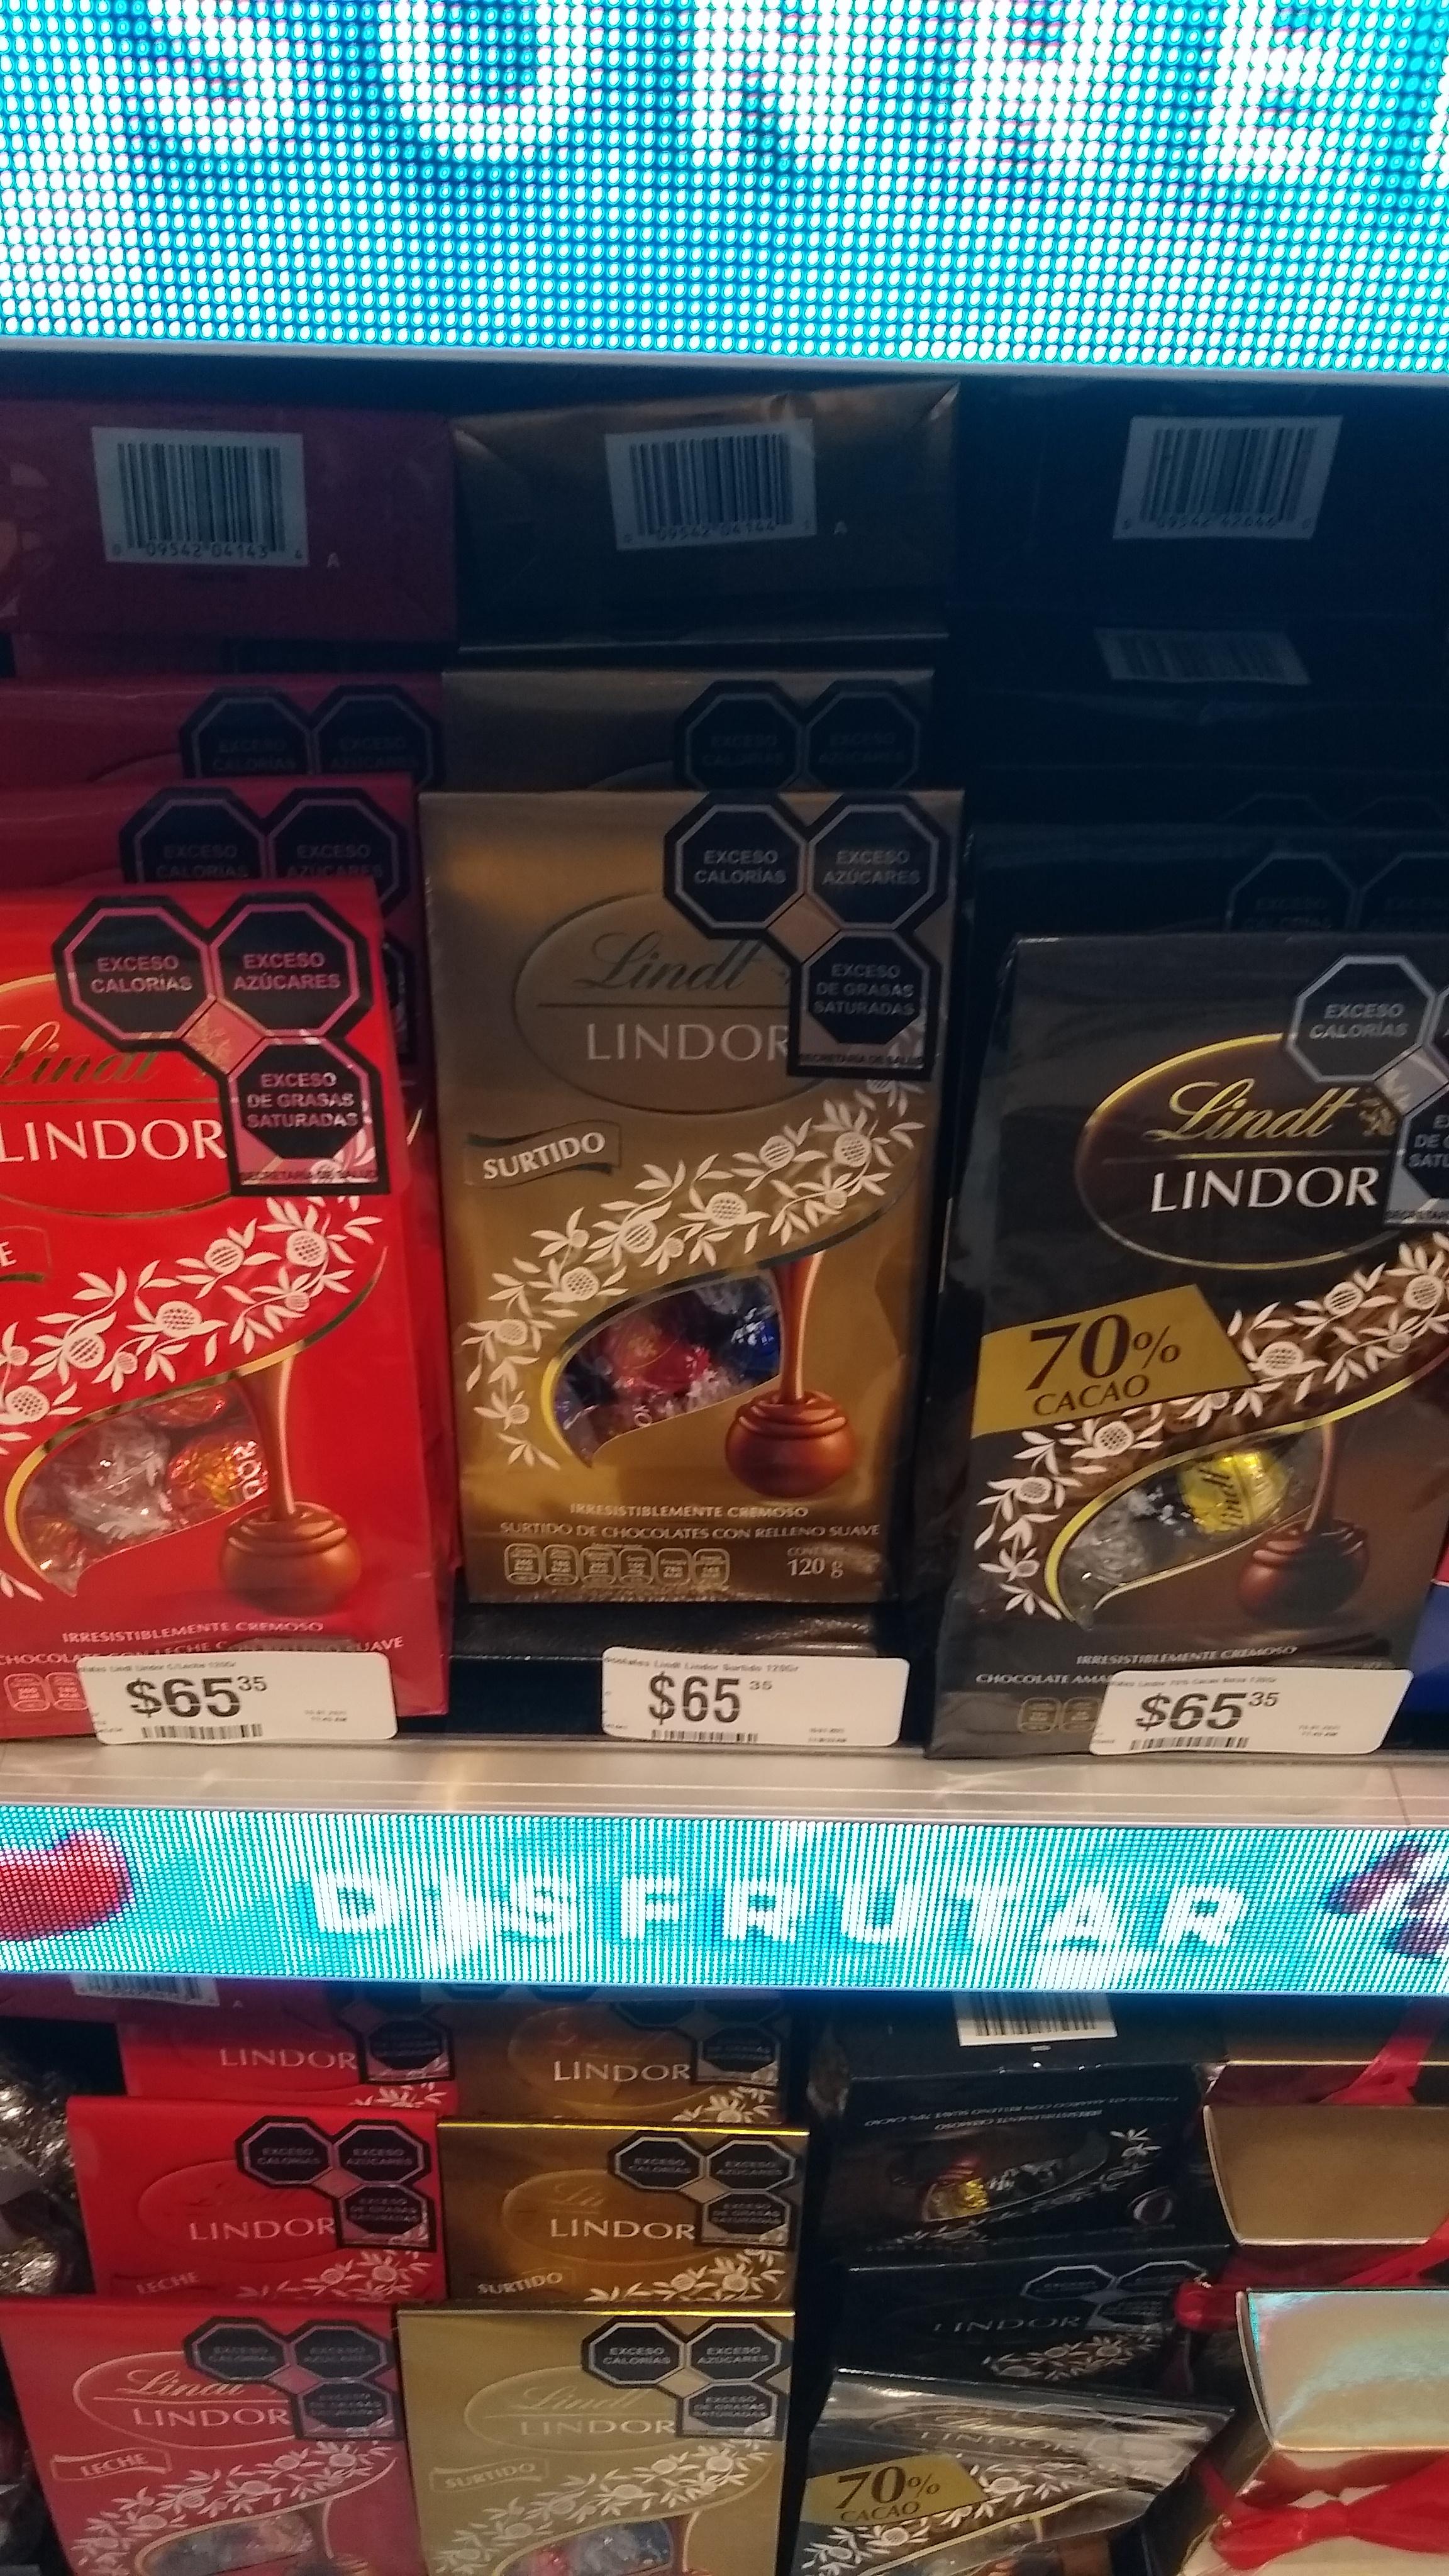 Chocolate Lindt Lindor de 120 g, en Chedraui Polanco a $65